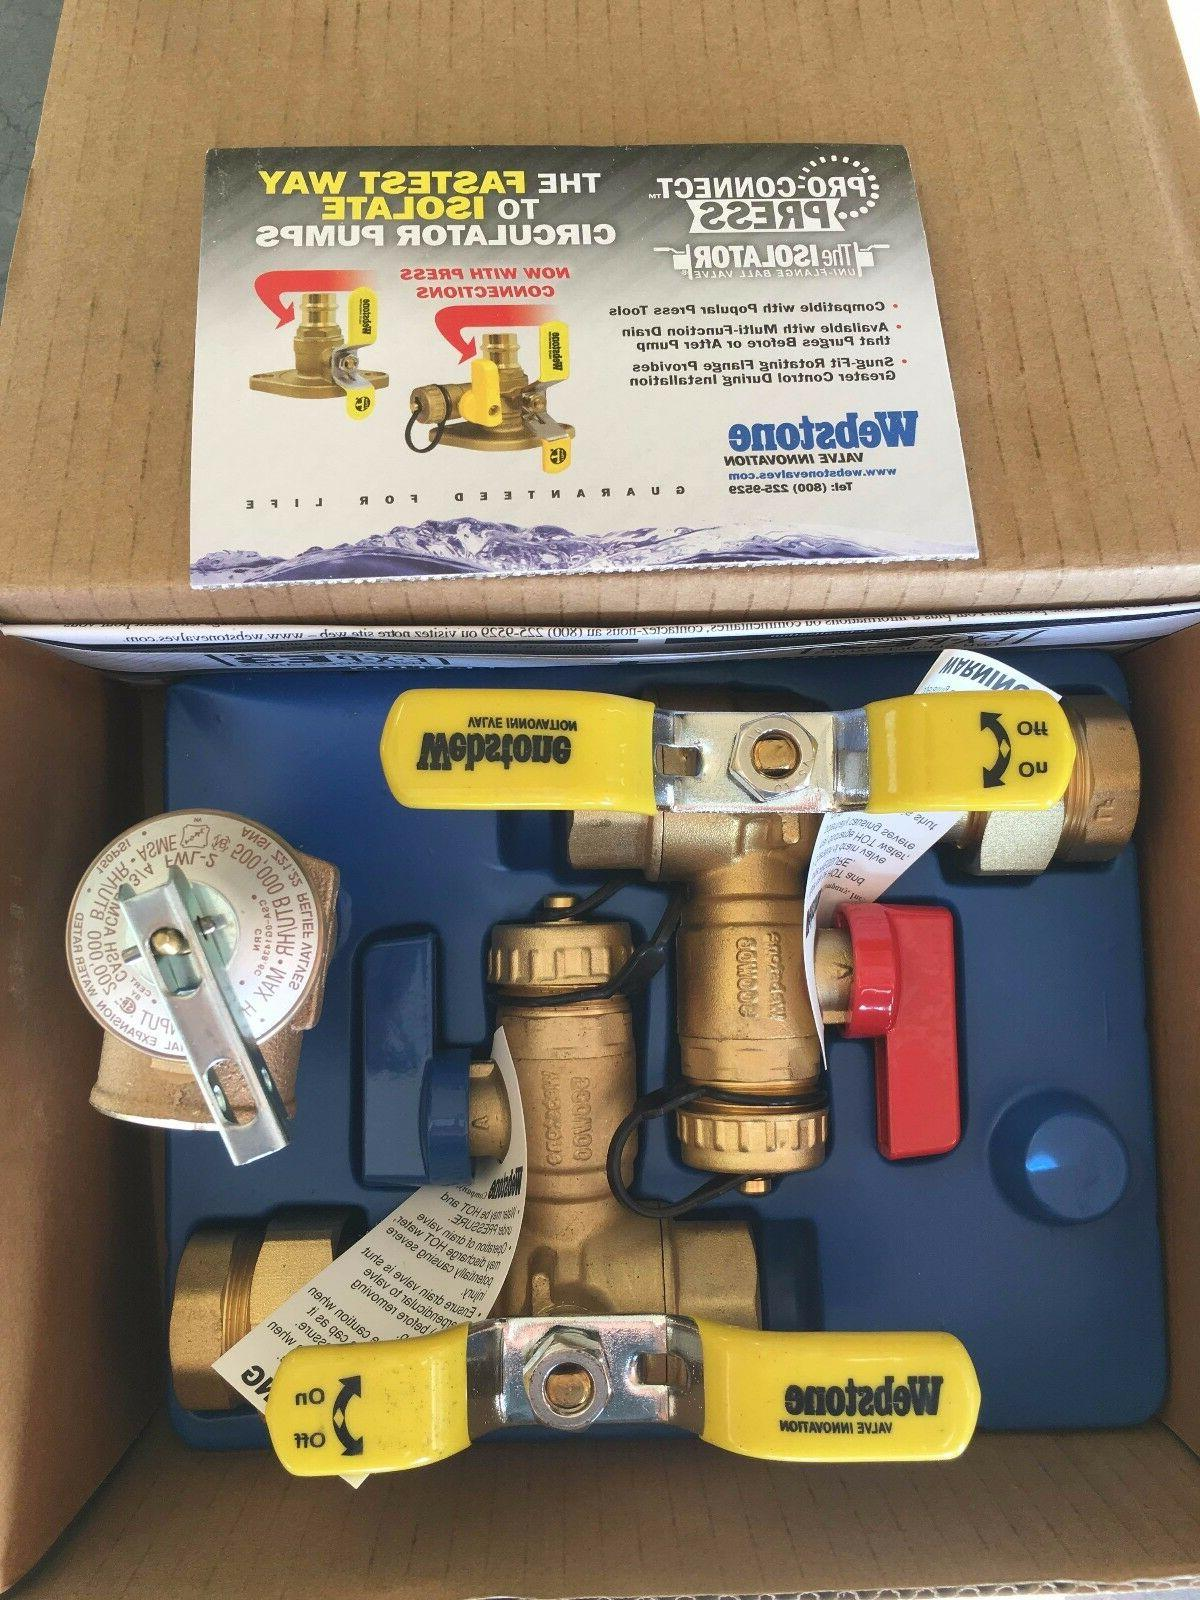 rtg20220ab watts tankless water heater